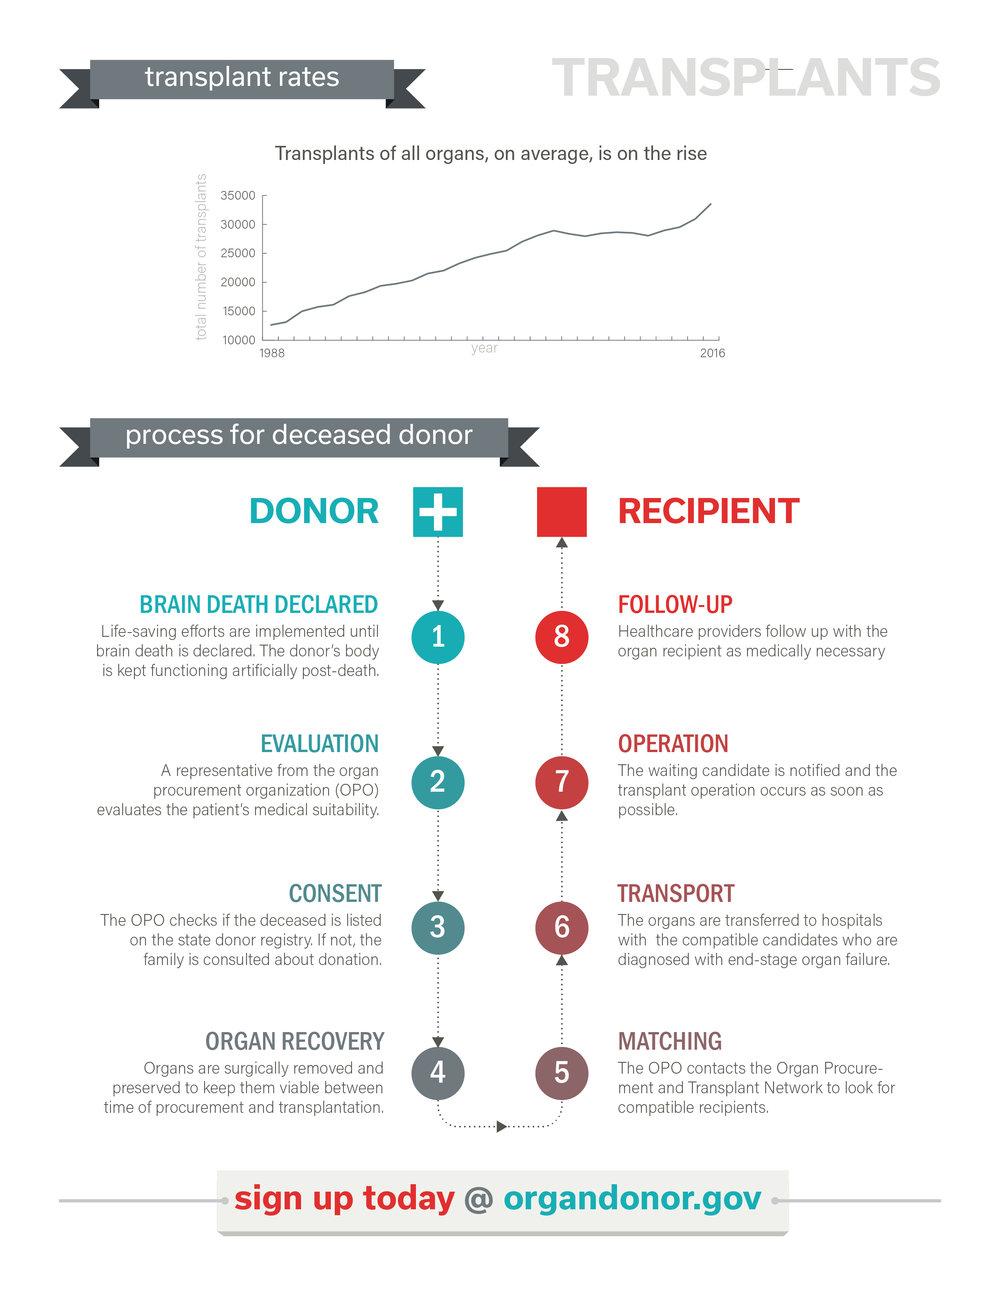 Pg. 3: Transplants